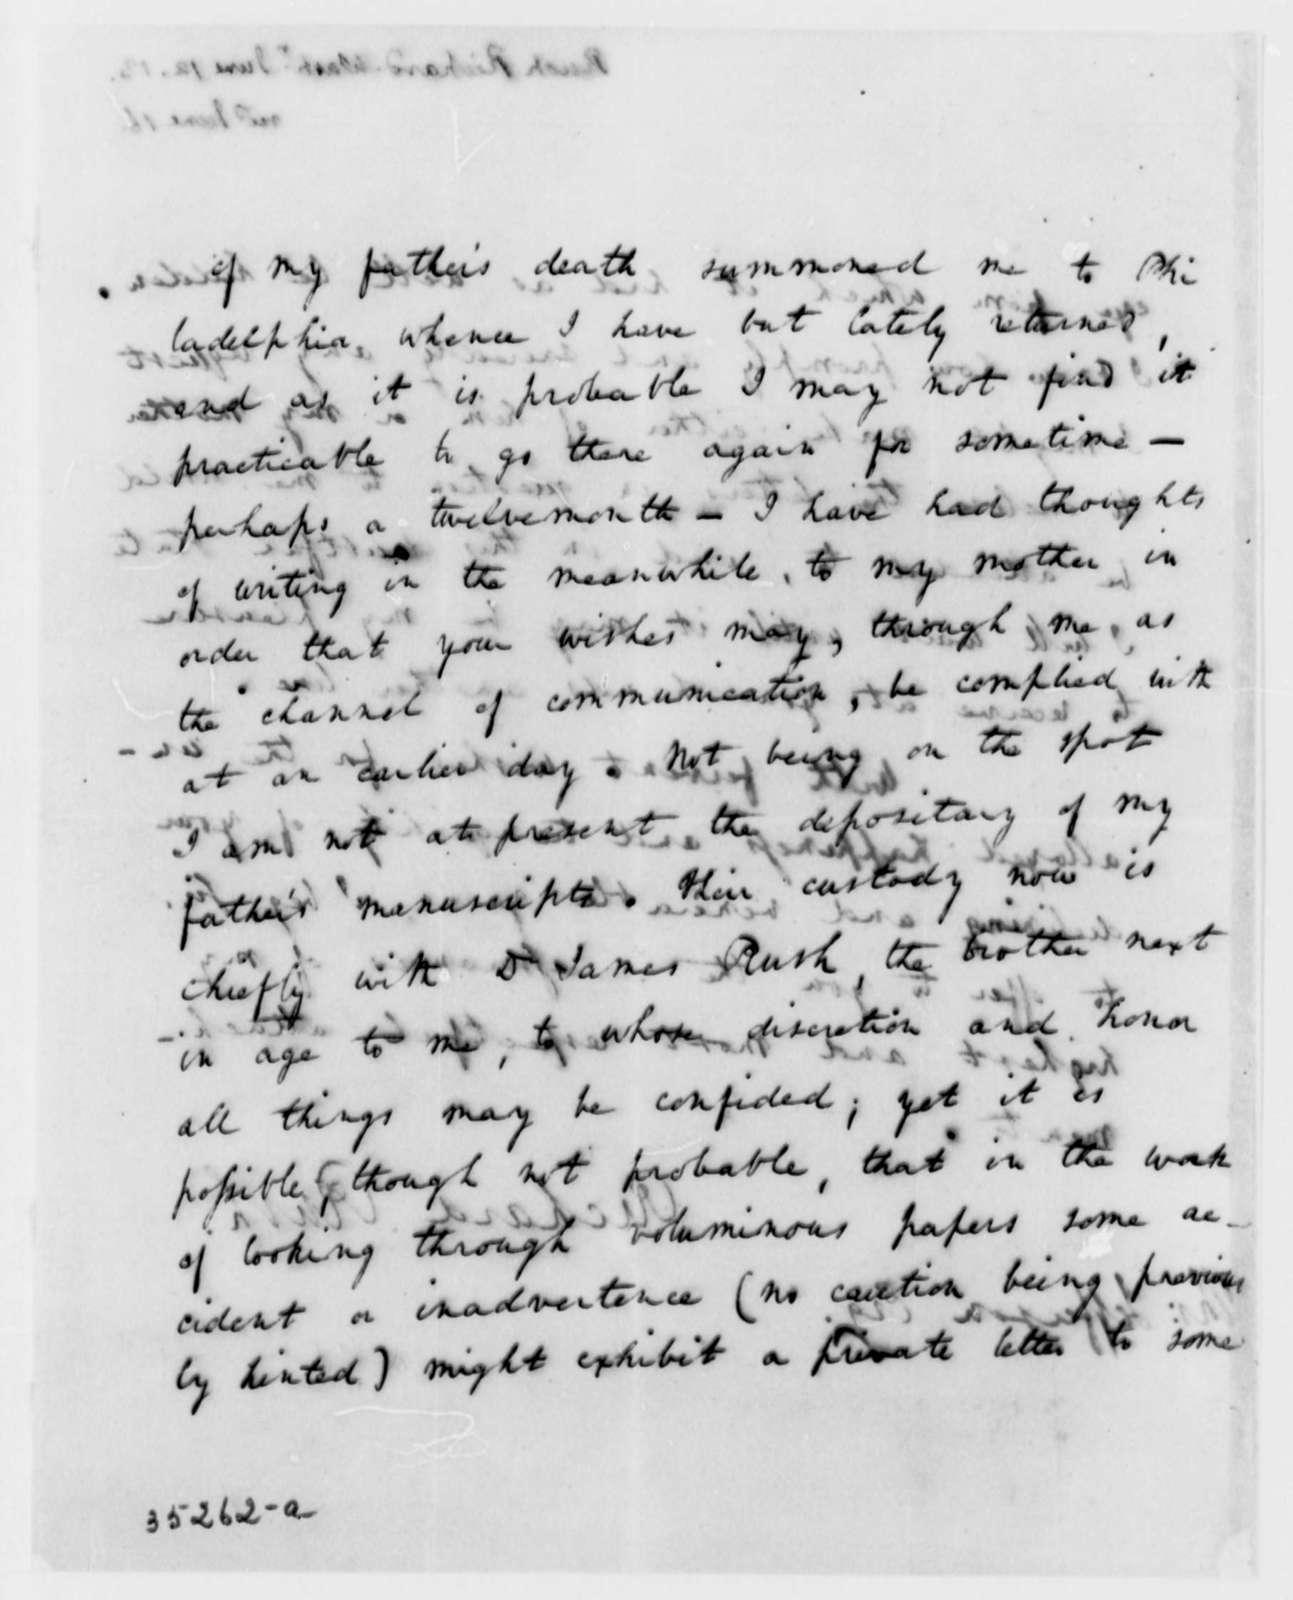 Richard Rush to Thomas Jefferson, June 12, 1813